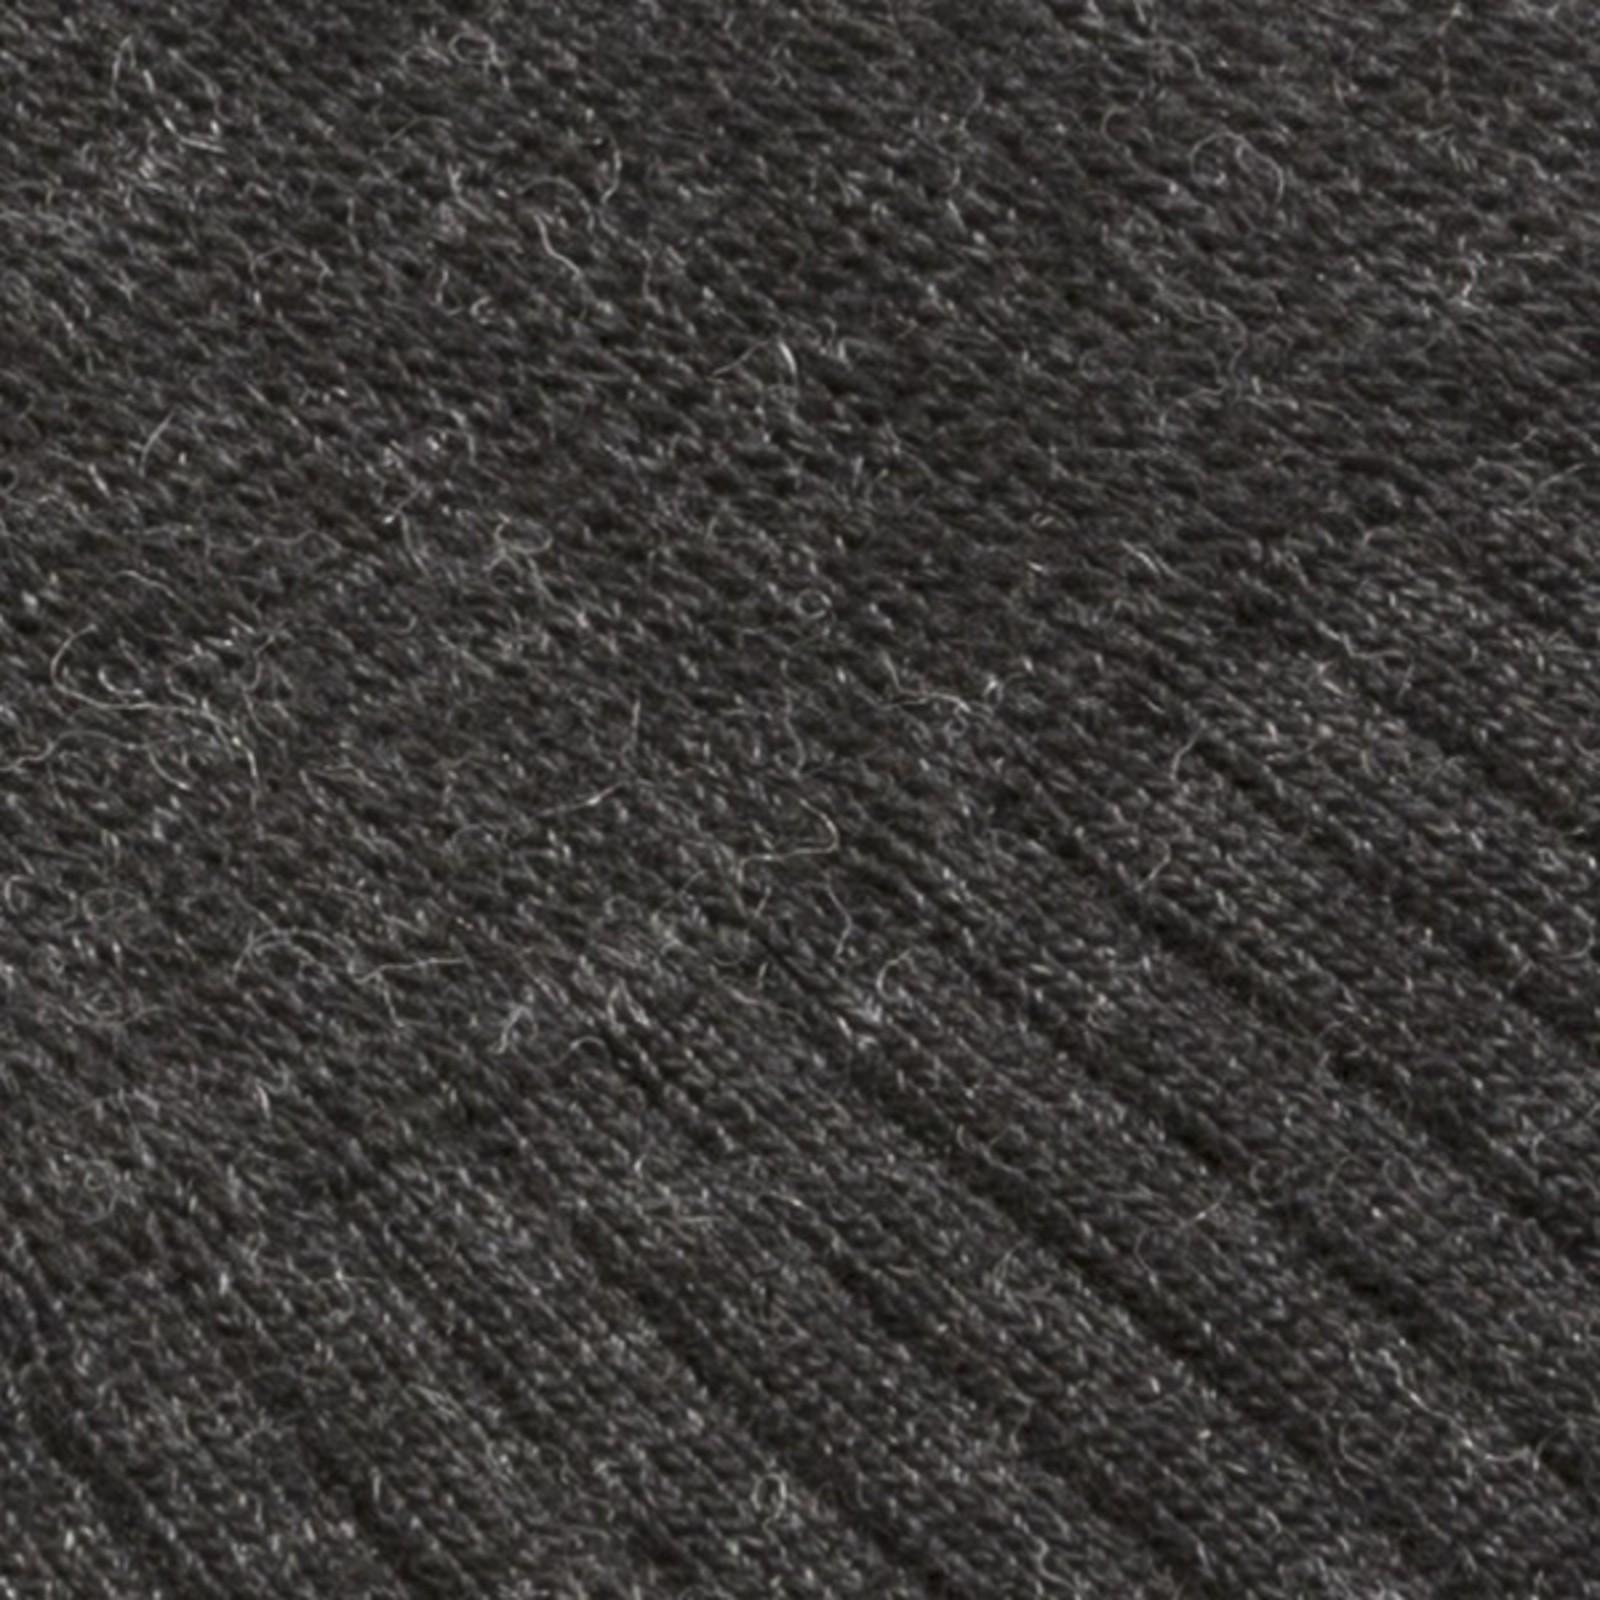 Carlo Lanza Darkgrey wool socks